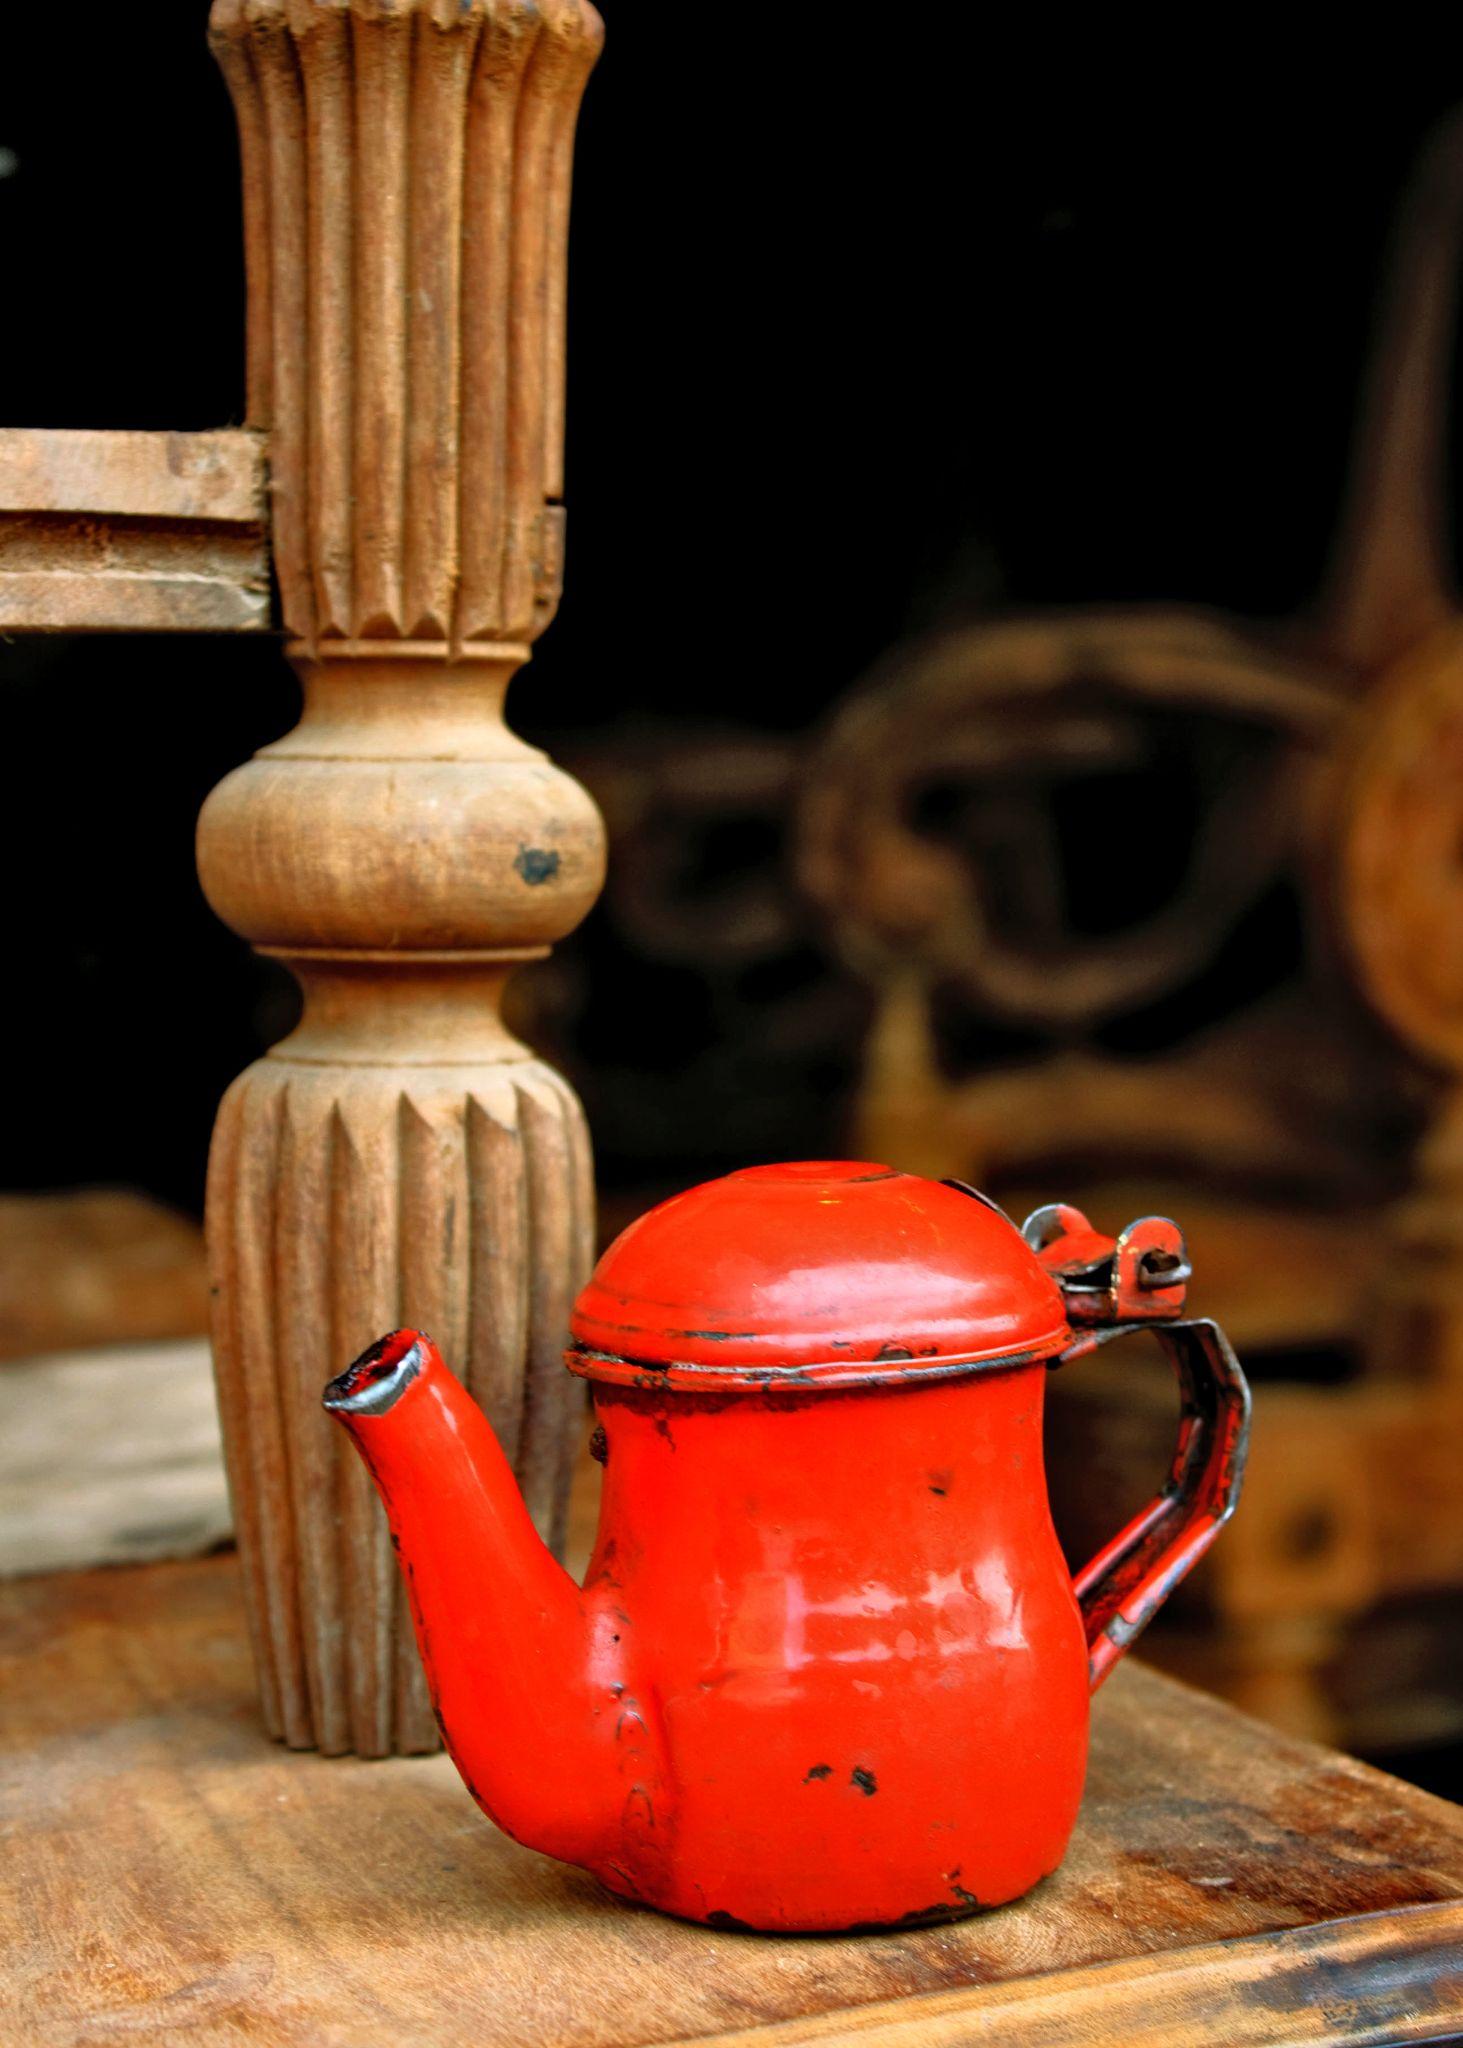 Tea catle ( Made in pakistan)  by J.hussain